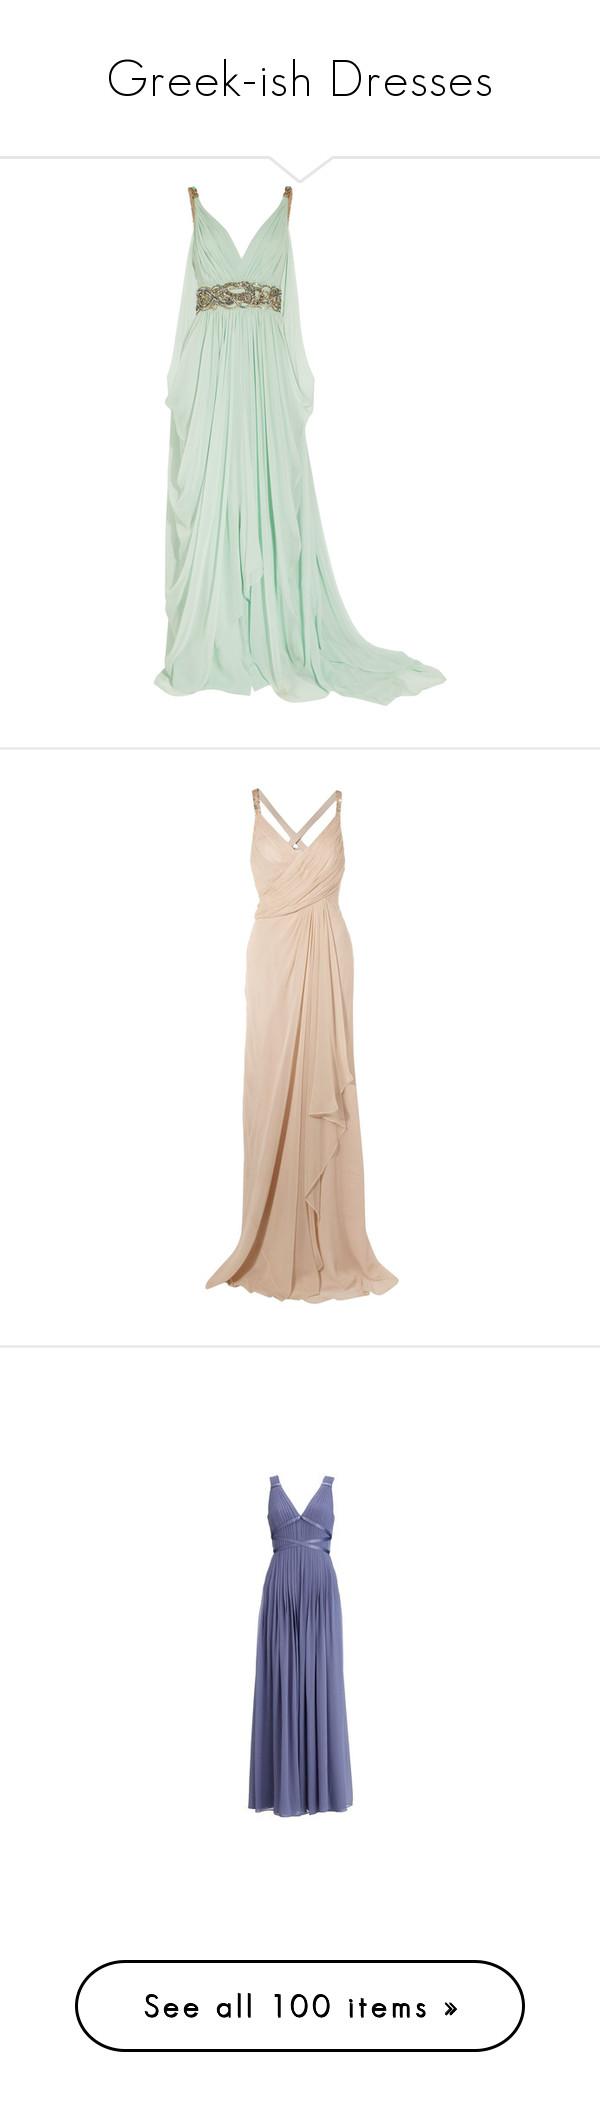 Greekish dresses